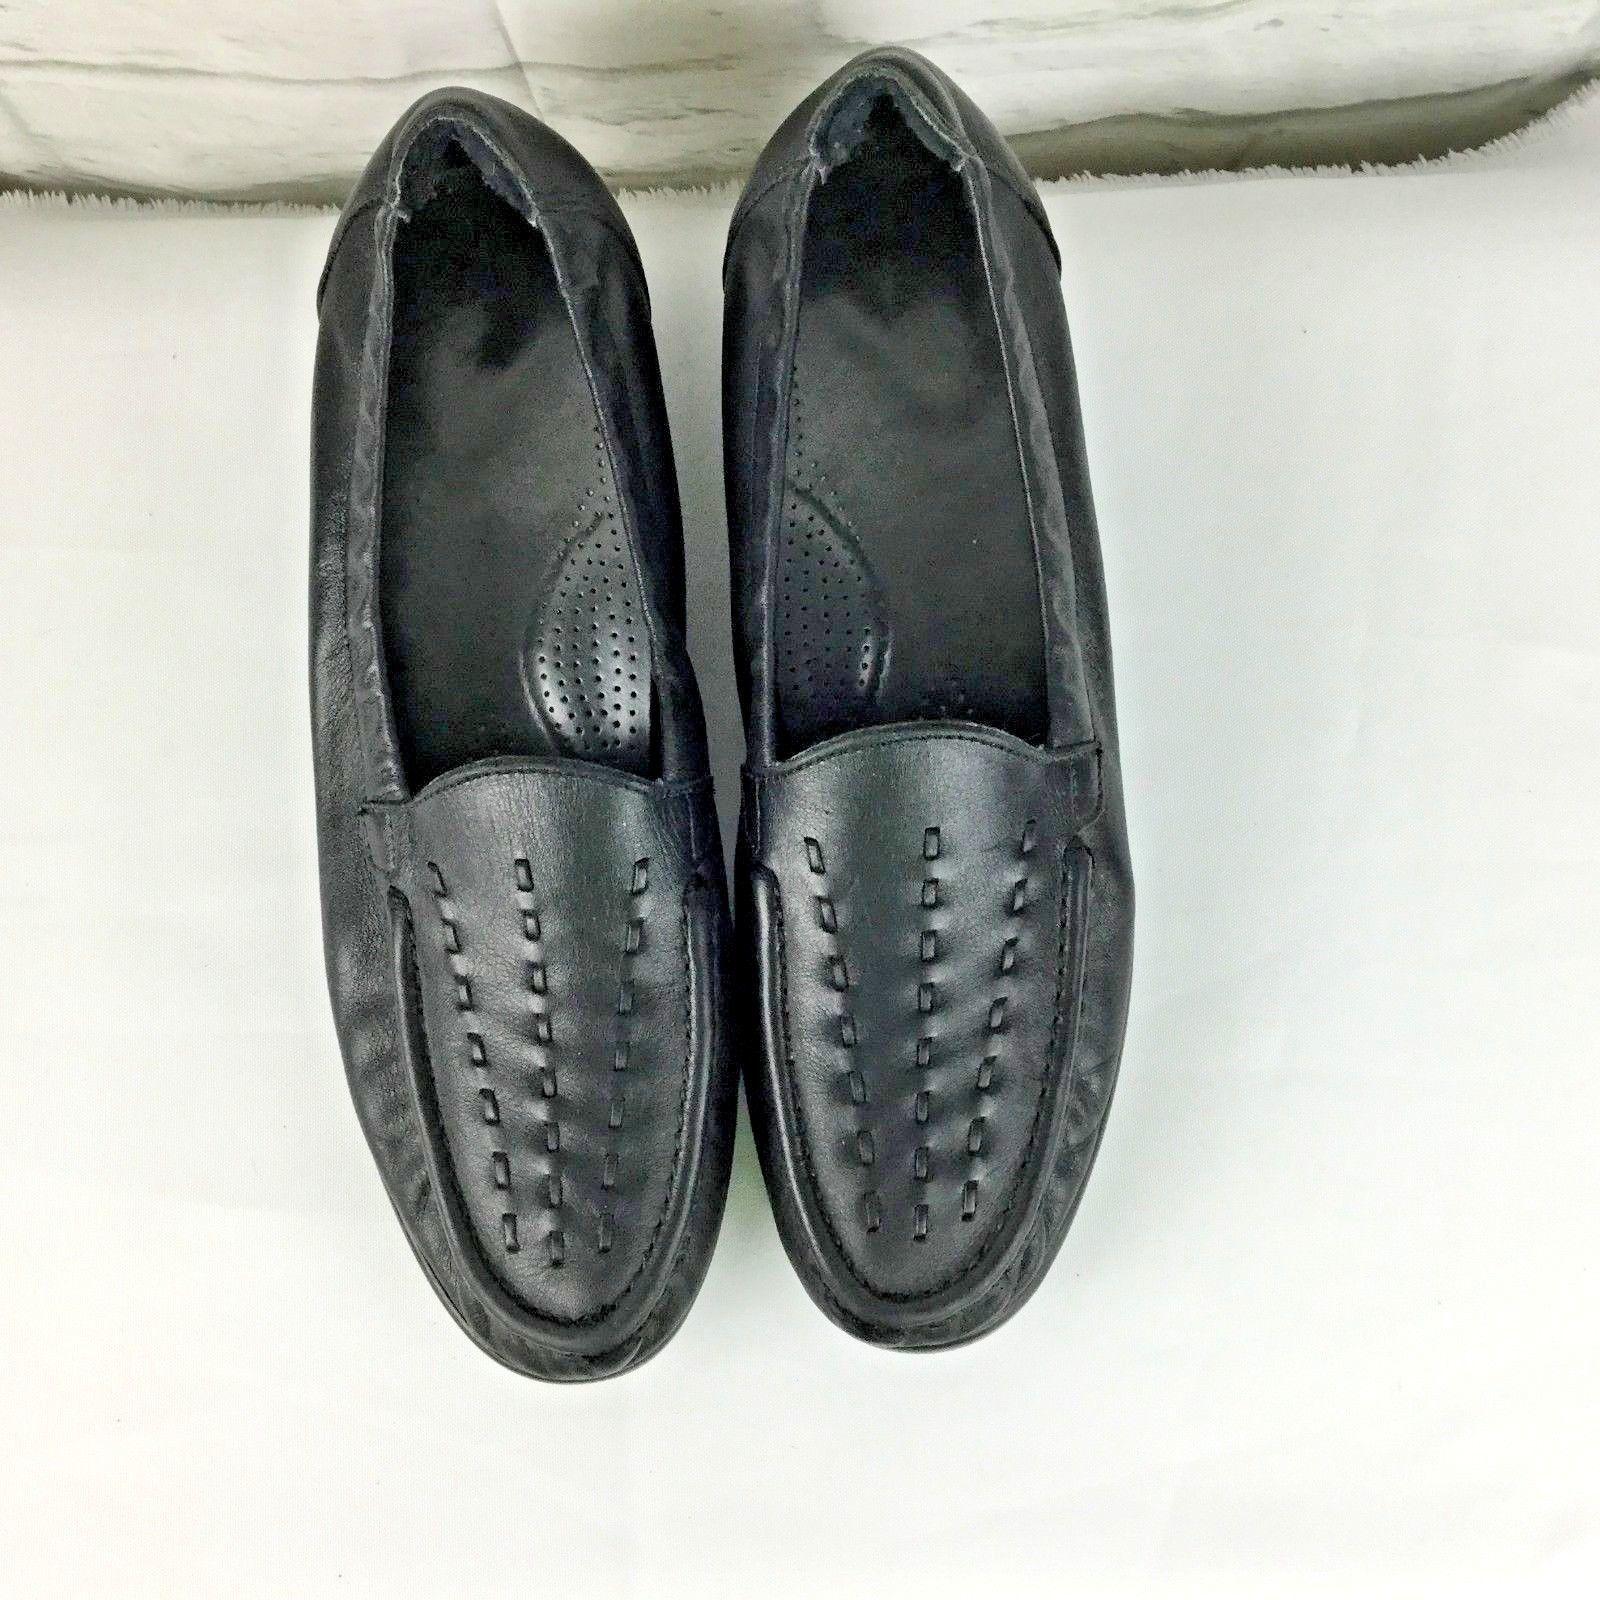 3e355e4c95b SAS Black Tripad Comfort Slip On Loafers Women s 11N Narrow Woven Leather  Upper